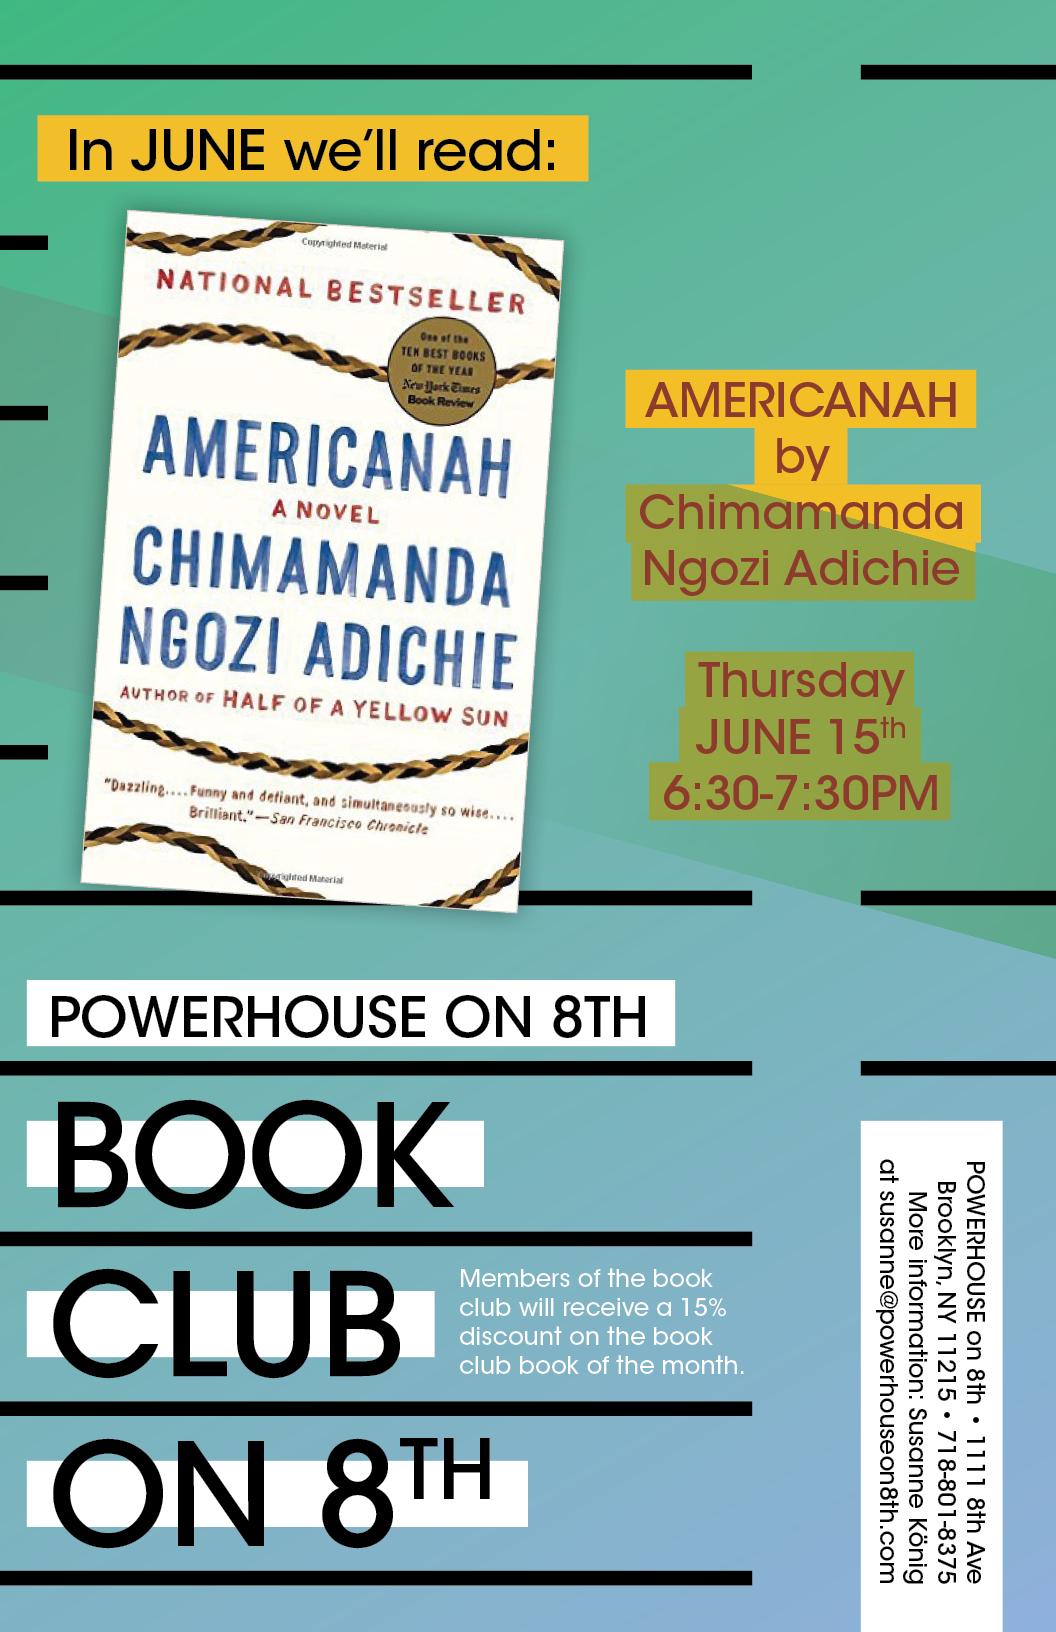 Book Club on 8th: Americanah by Chimamanda Ngozi Adichie